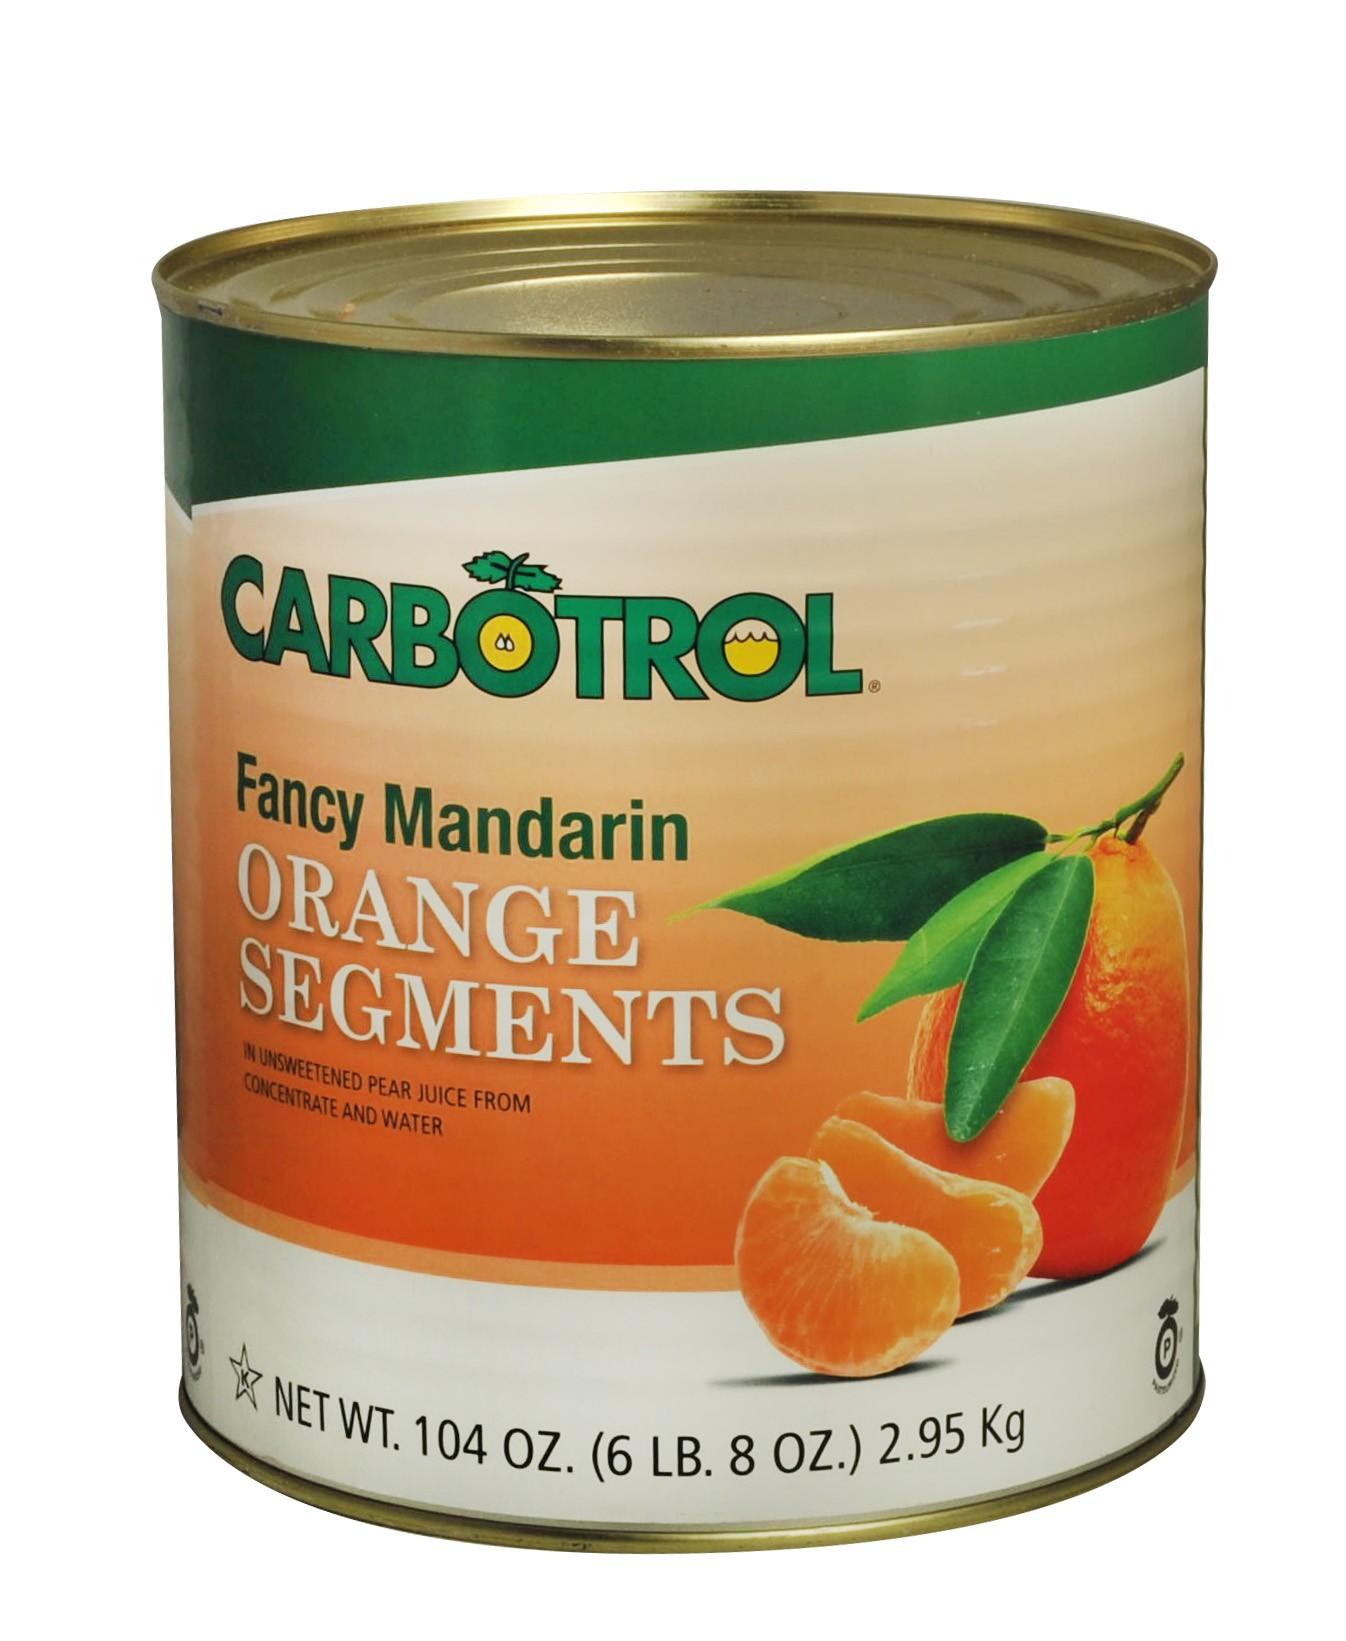 Carbotrol #10 Juice Packed Canned Fruit, Mandarin Oranges (1 - 104oz Can)